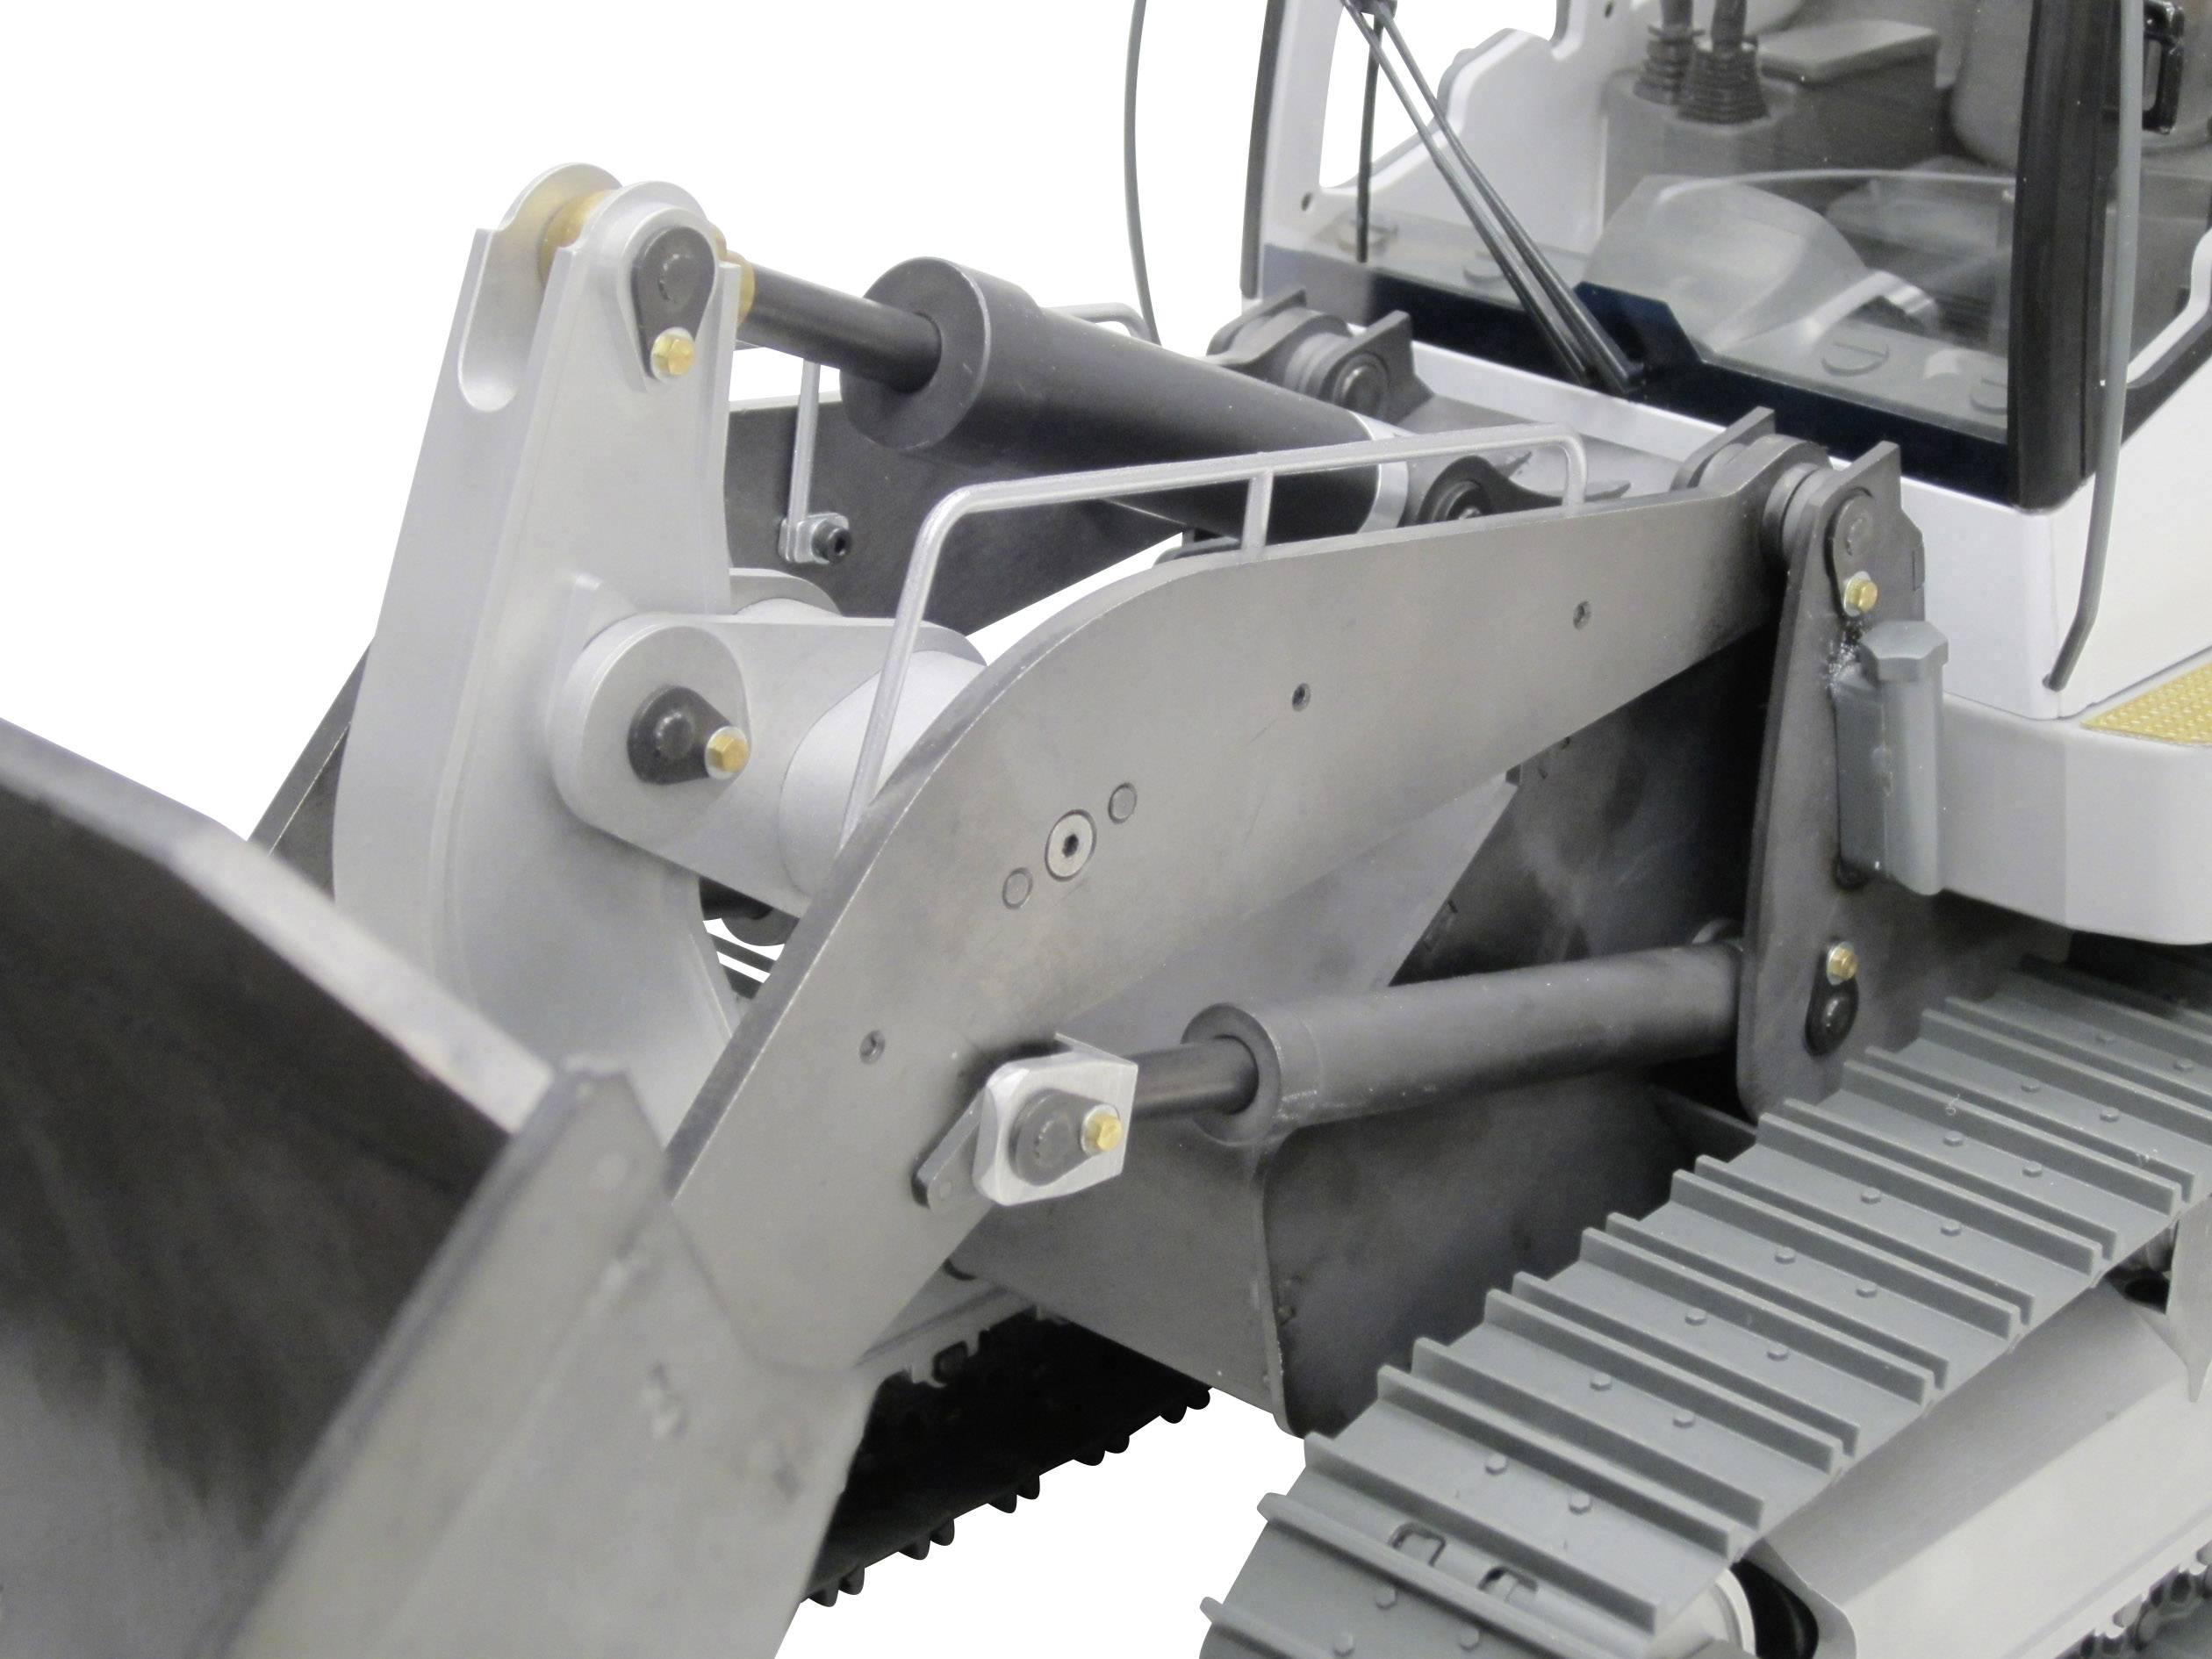 Carson Modellsport 500907111 Liebherr LR634 1:14  rc funkcijski model komplet za sastavljanje